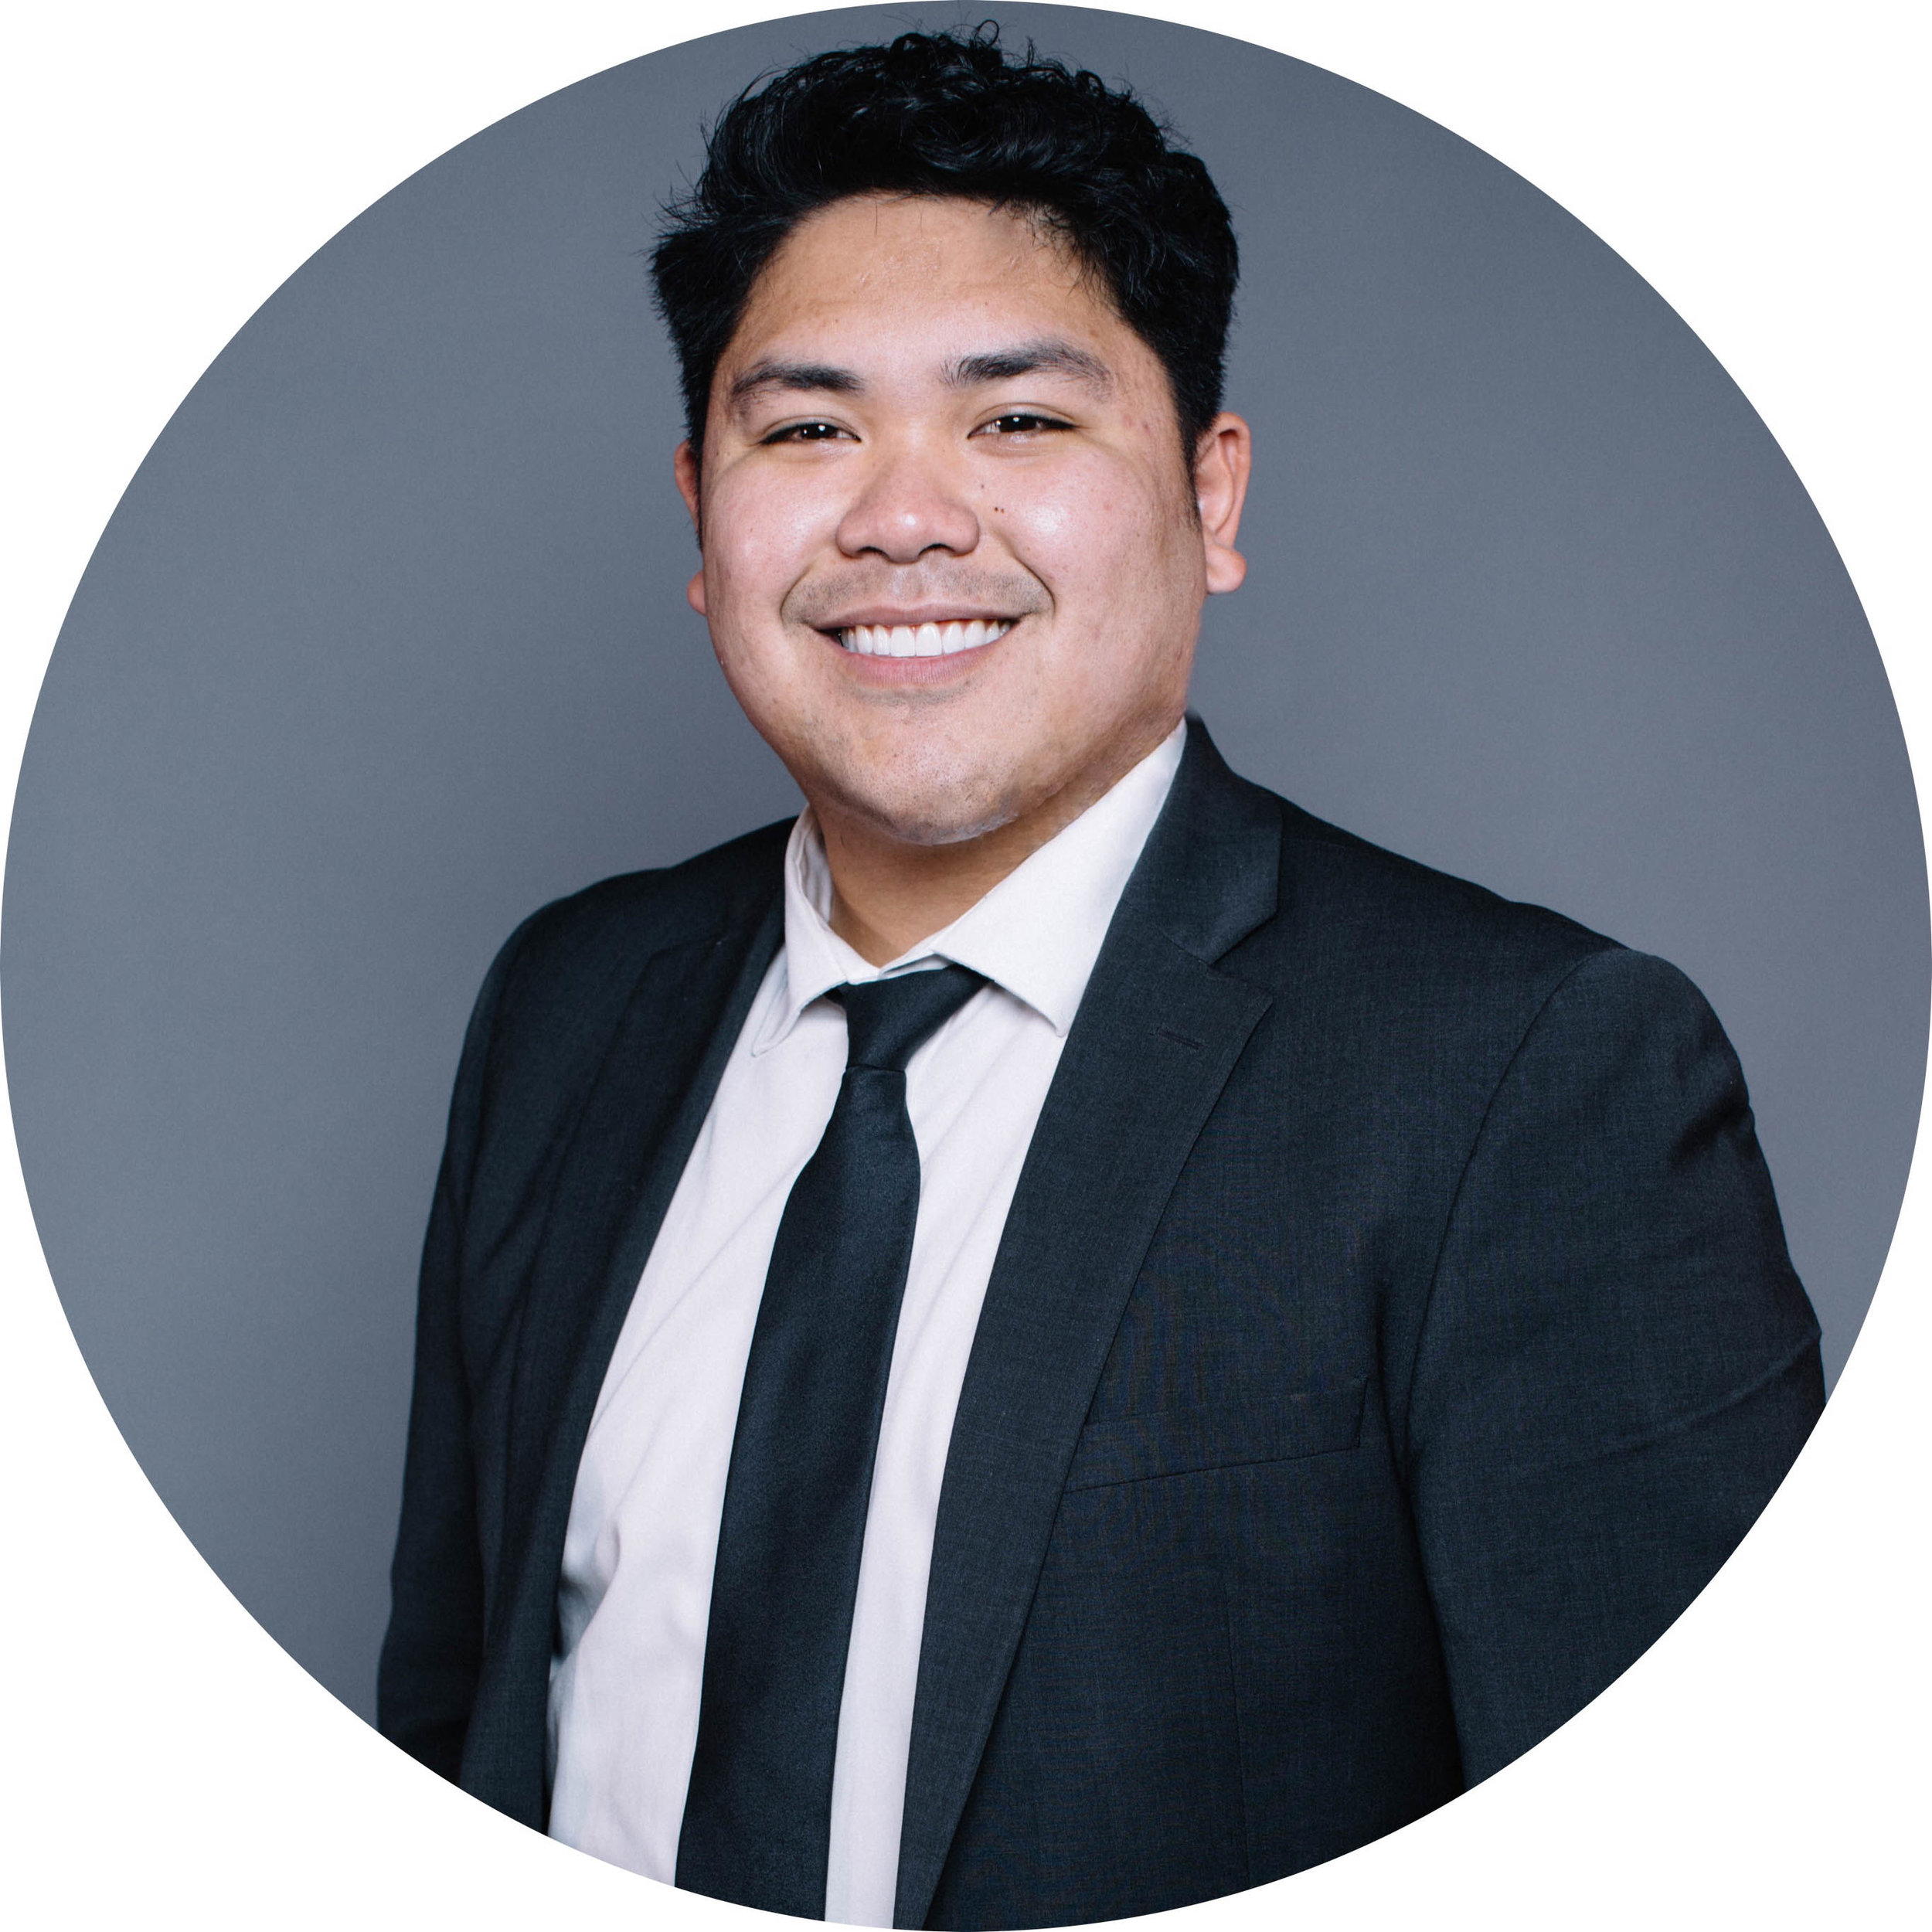 Líder de Jóvenes Adultos - Nate Torino